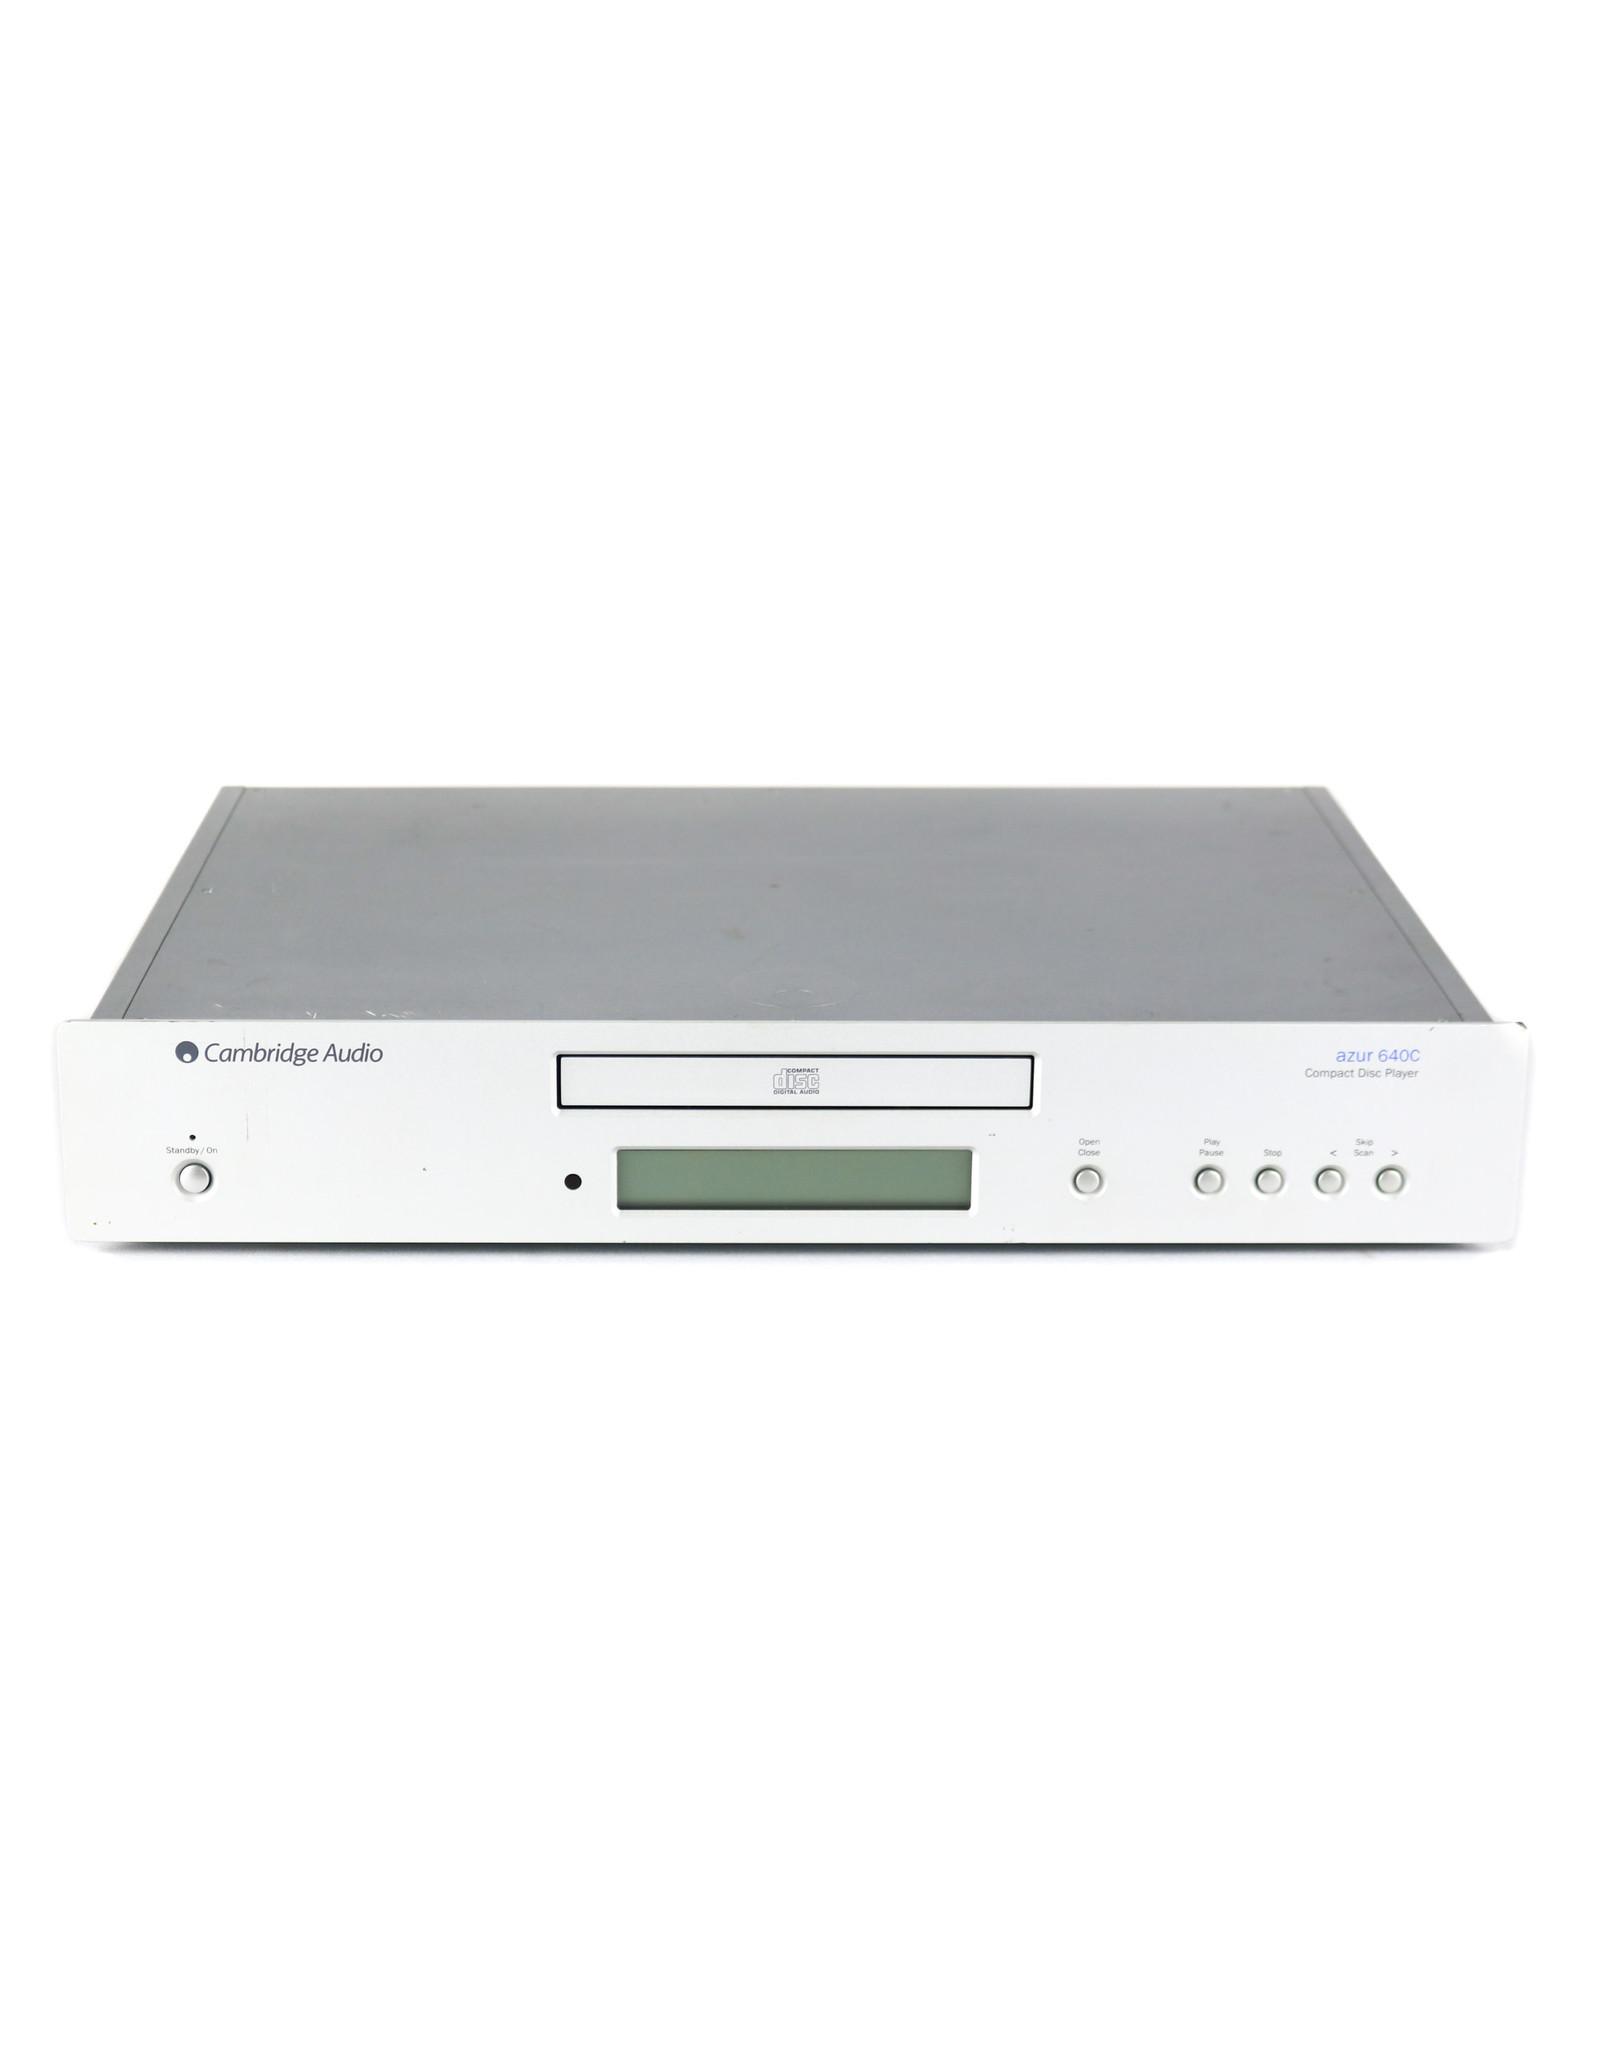 Cambridge Audio Cambridge Audio 640C CD Player Silver USED